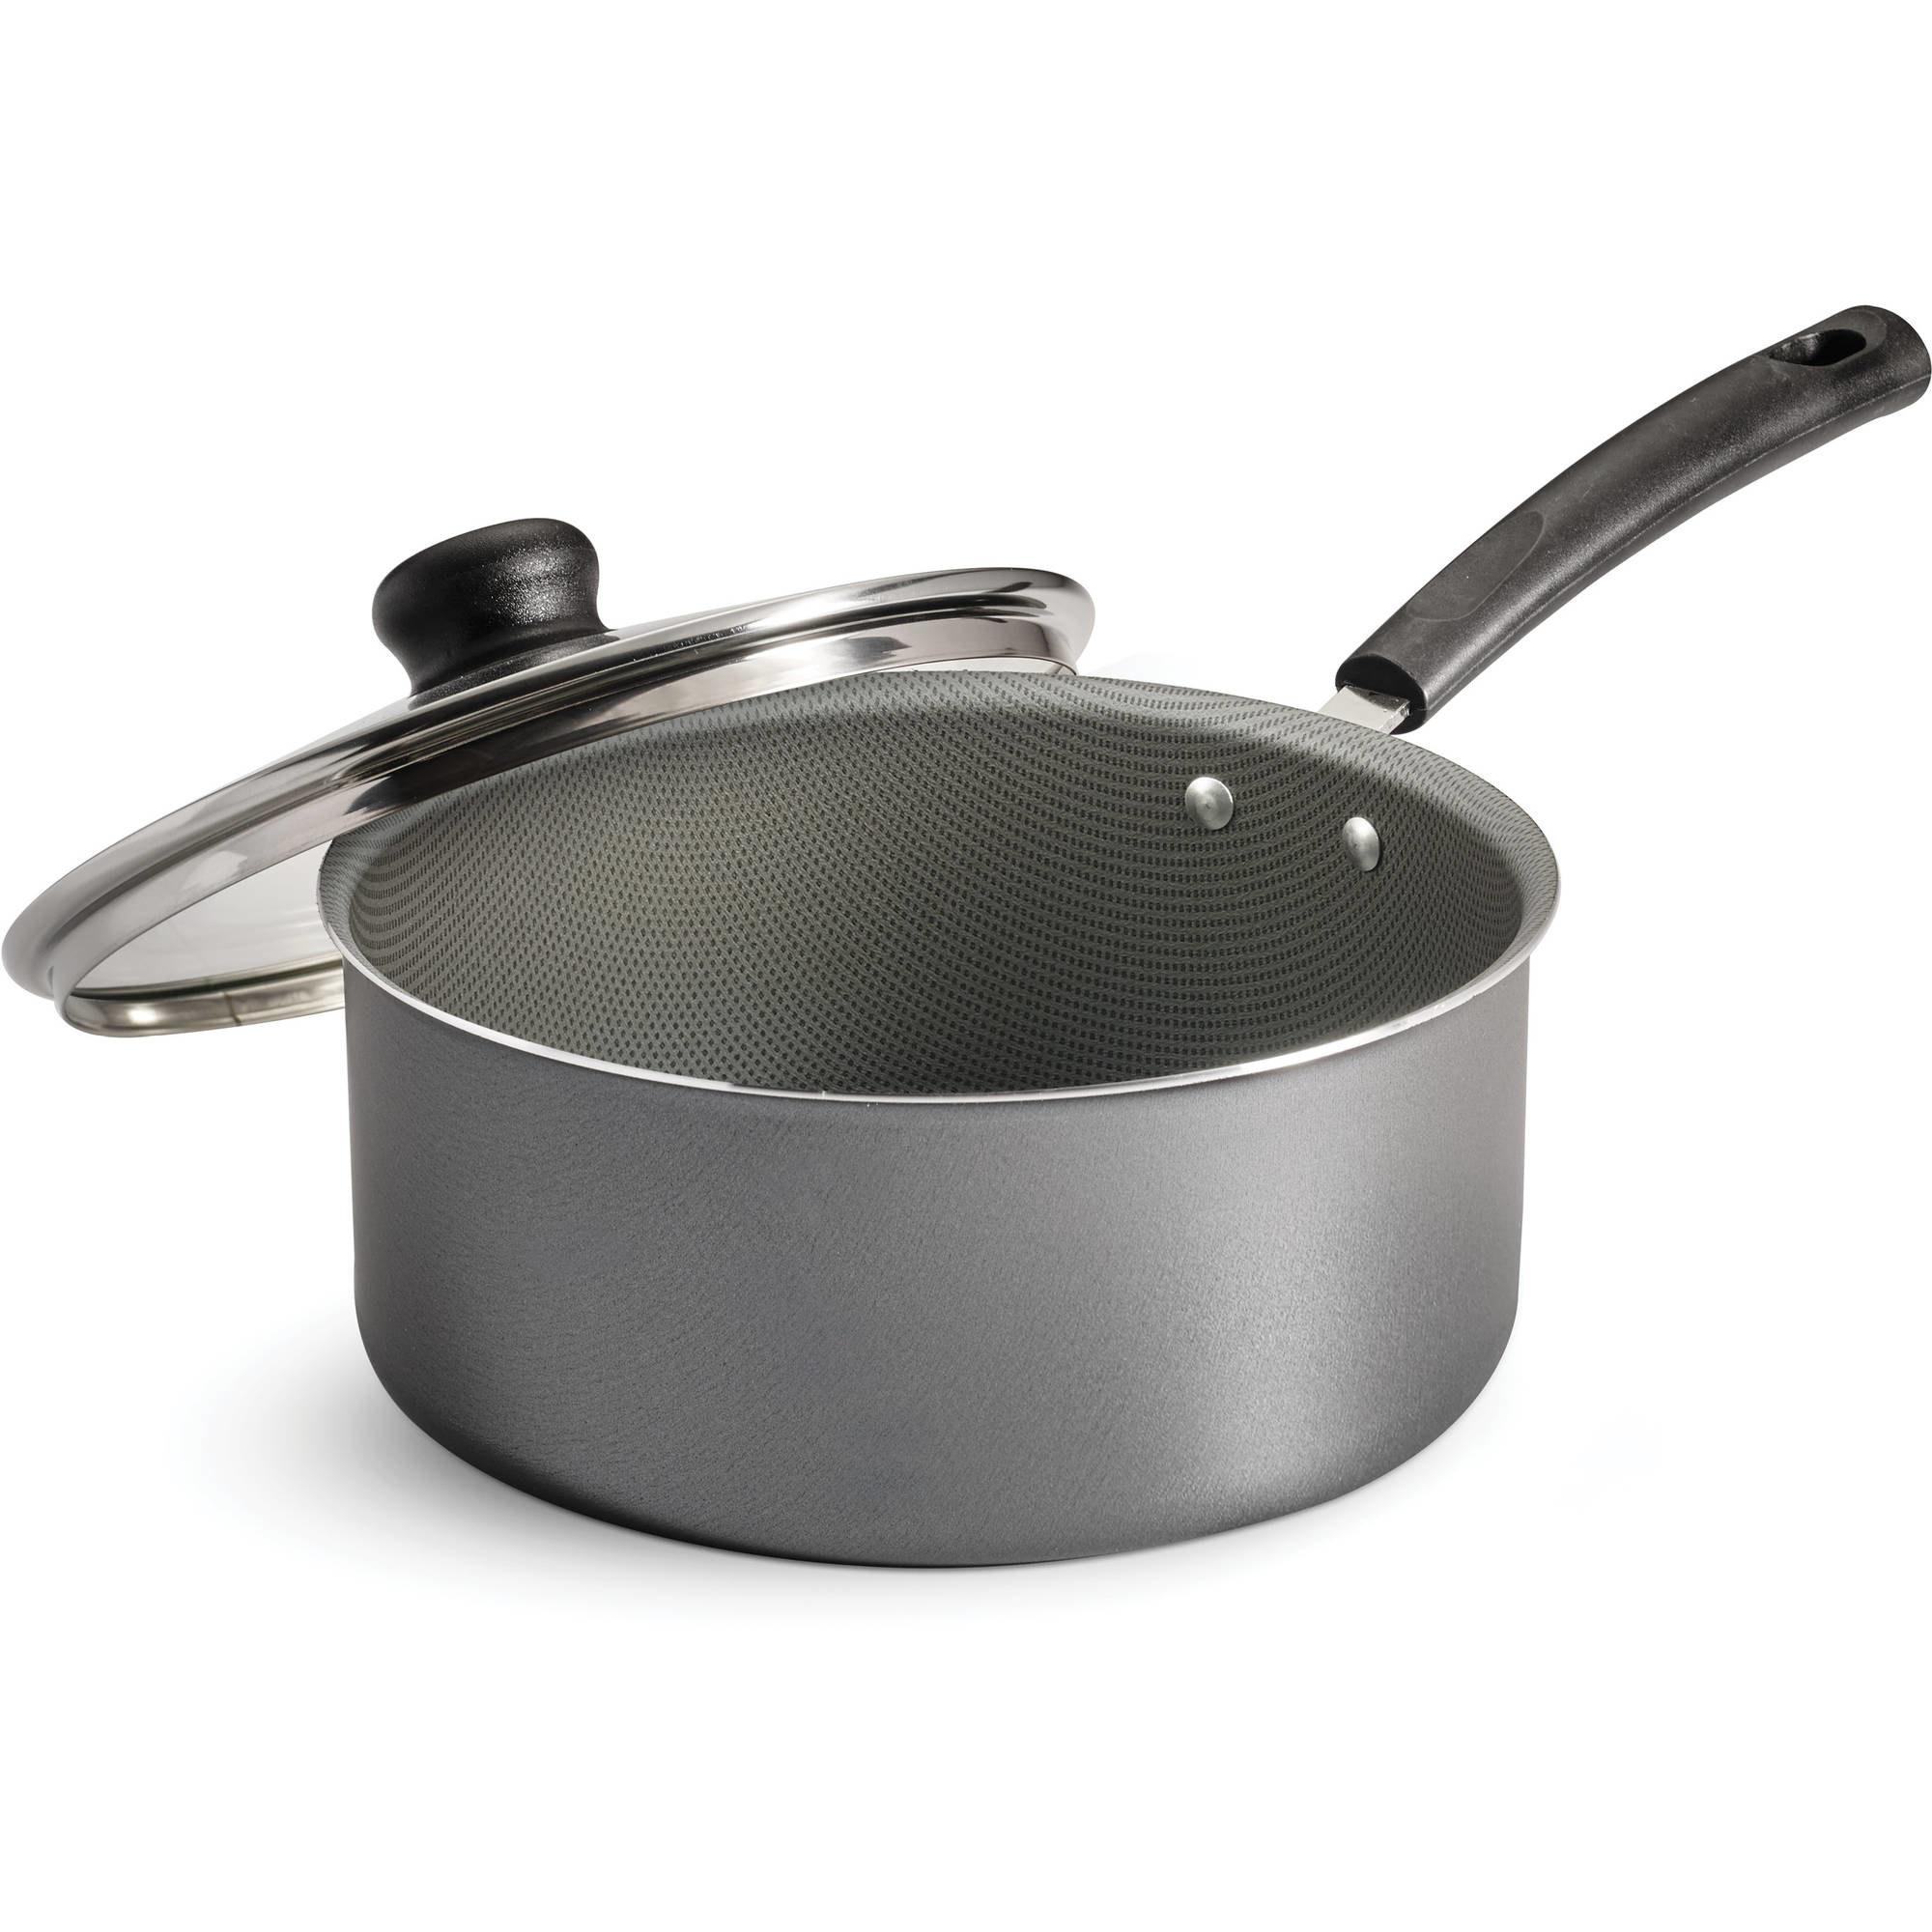 Saucepan on a white background